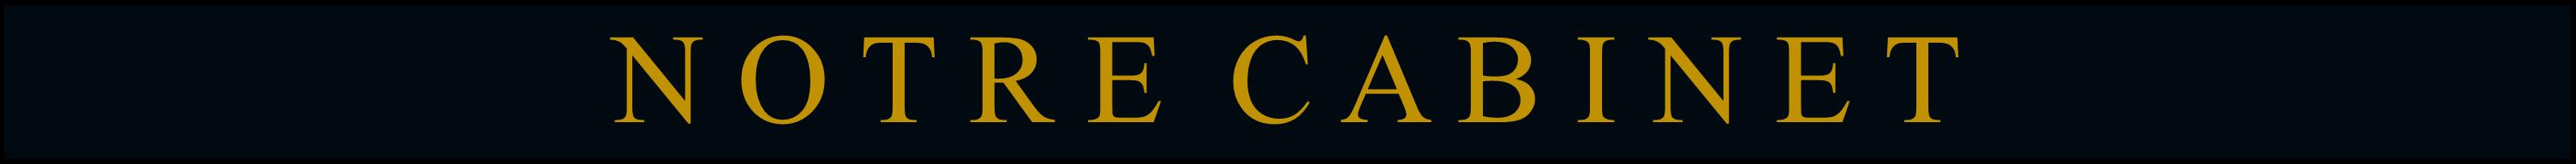 Notre_Cabinet